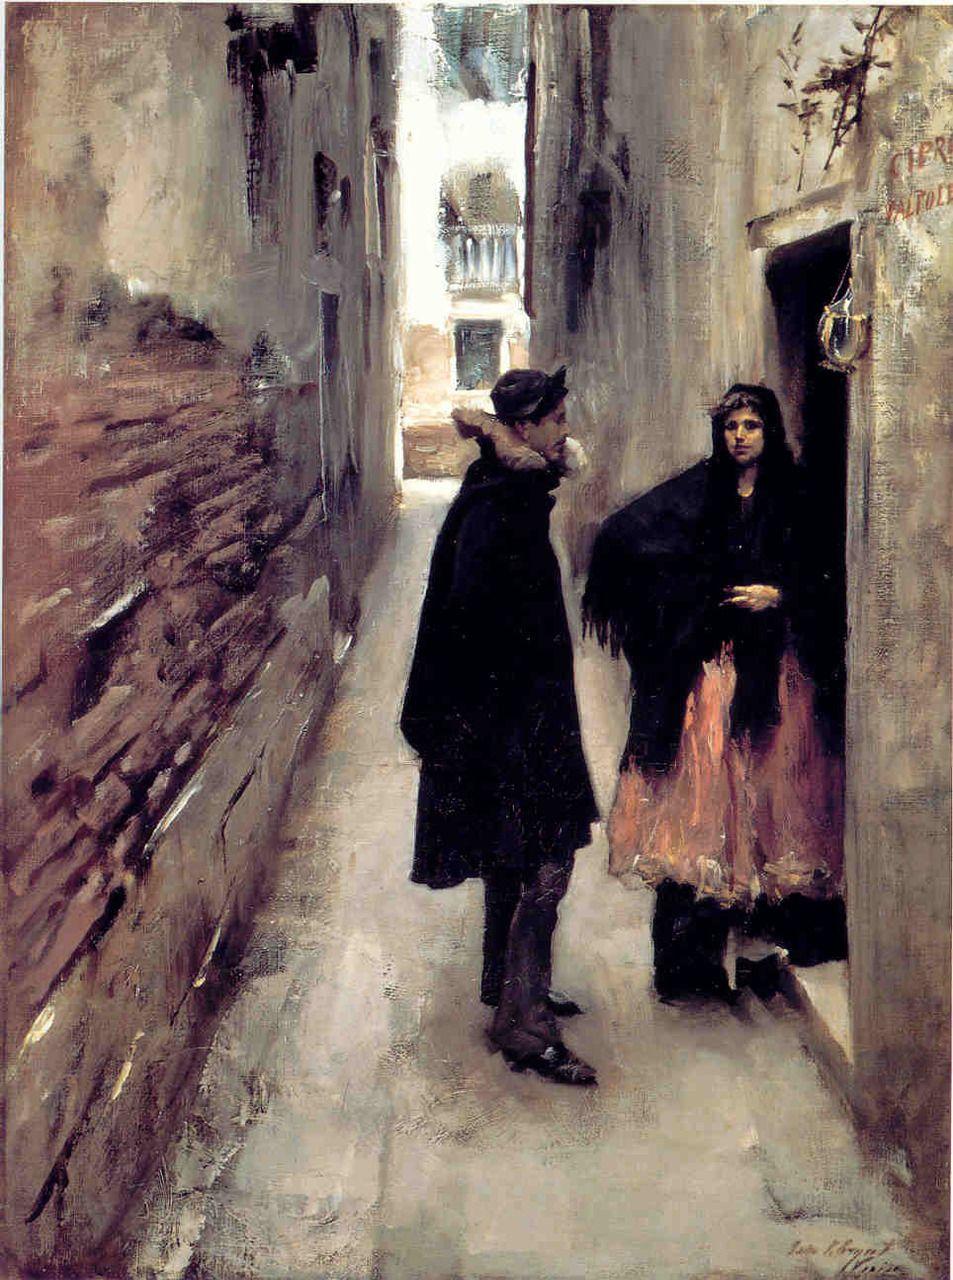 John Singer Sargent. A Street in Venice. c. 1880-1882.